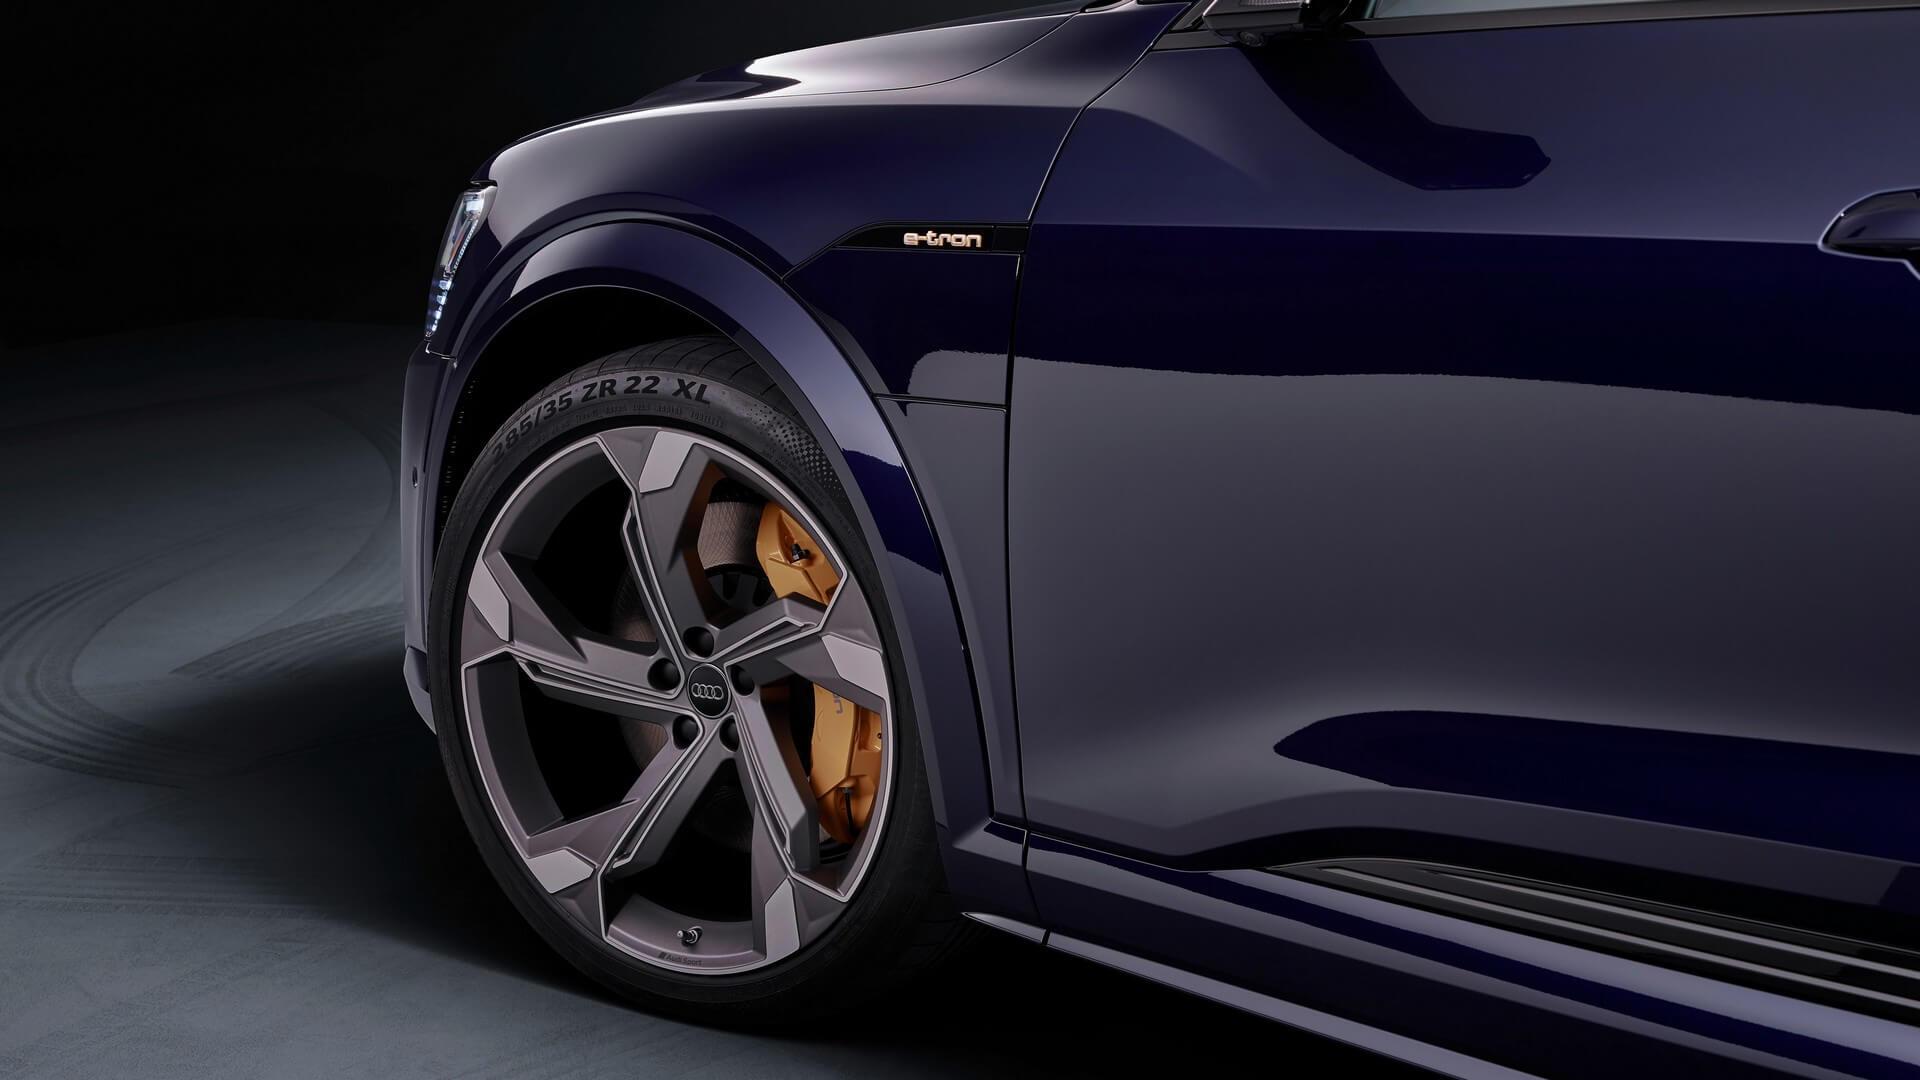 Audi-E-Tron-S-and-E-Tron-S-Sportback-2020-114